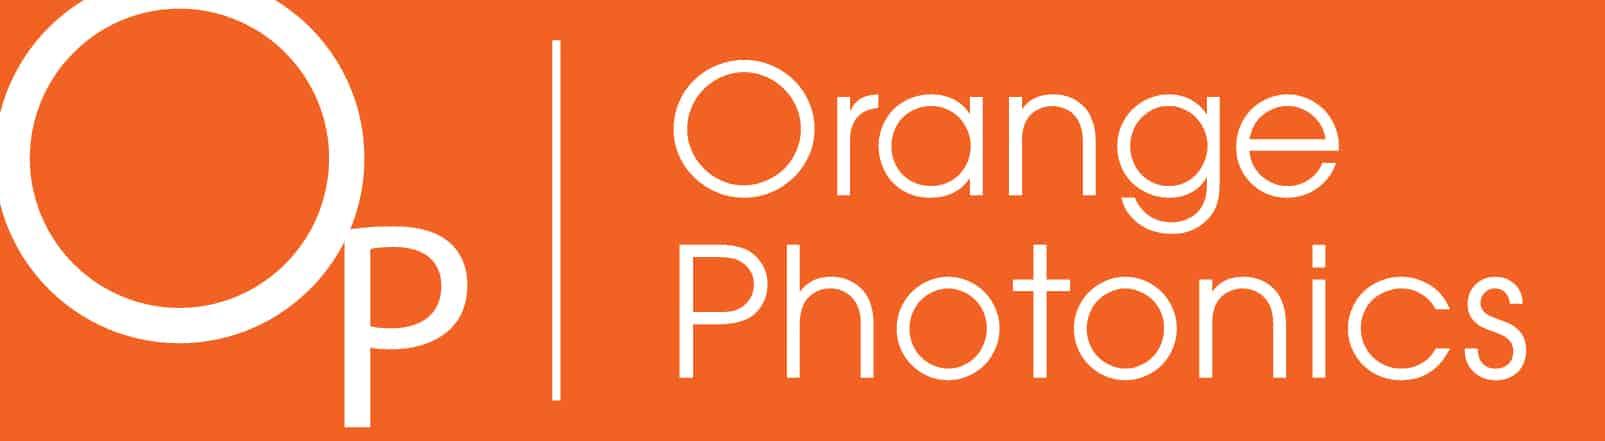 Orange Photonics